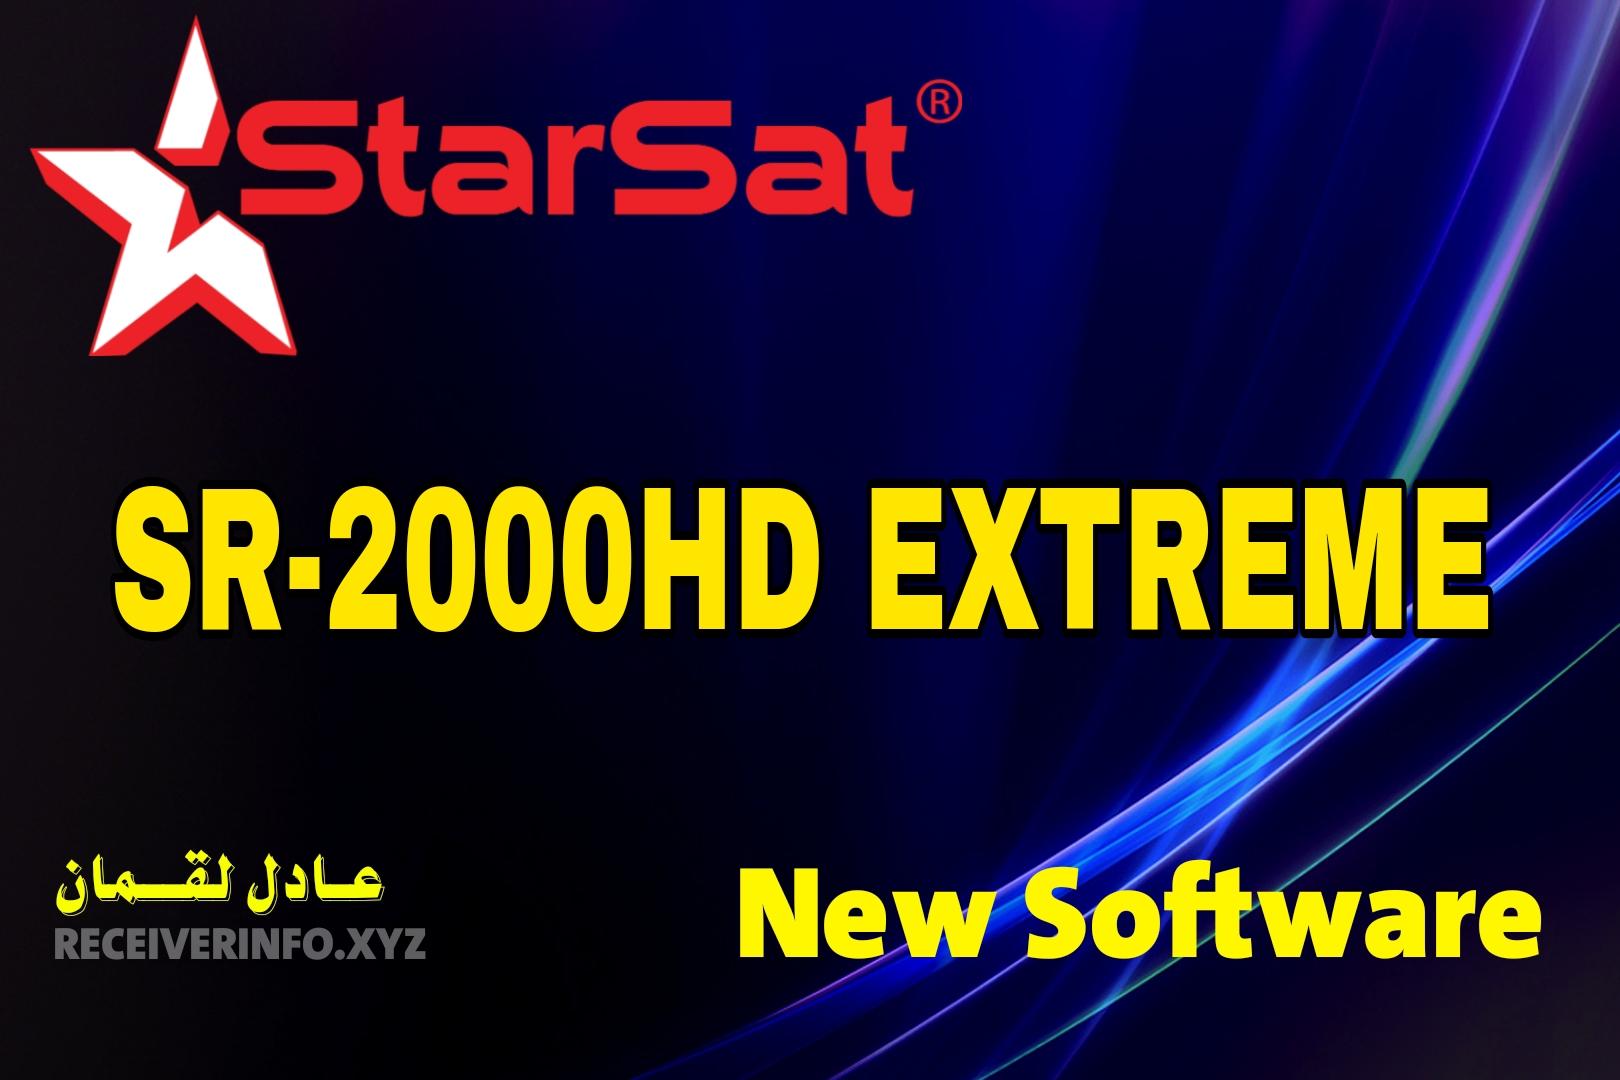 starsat 2000 extreme